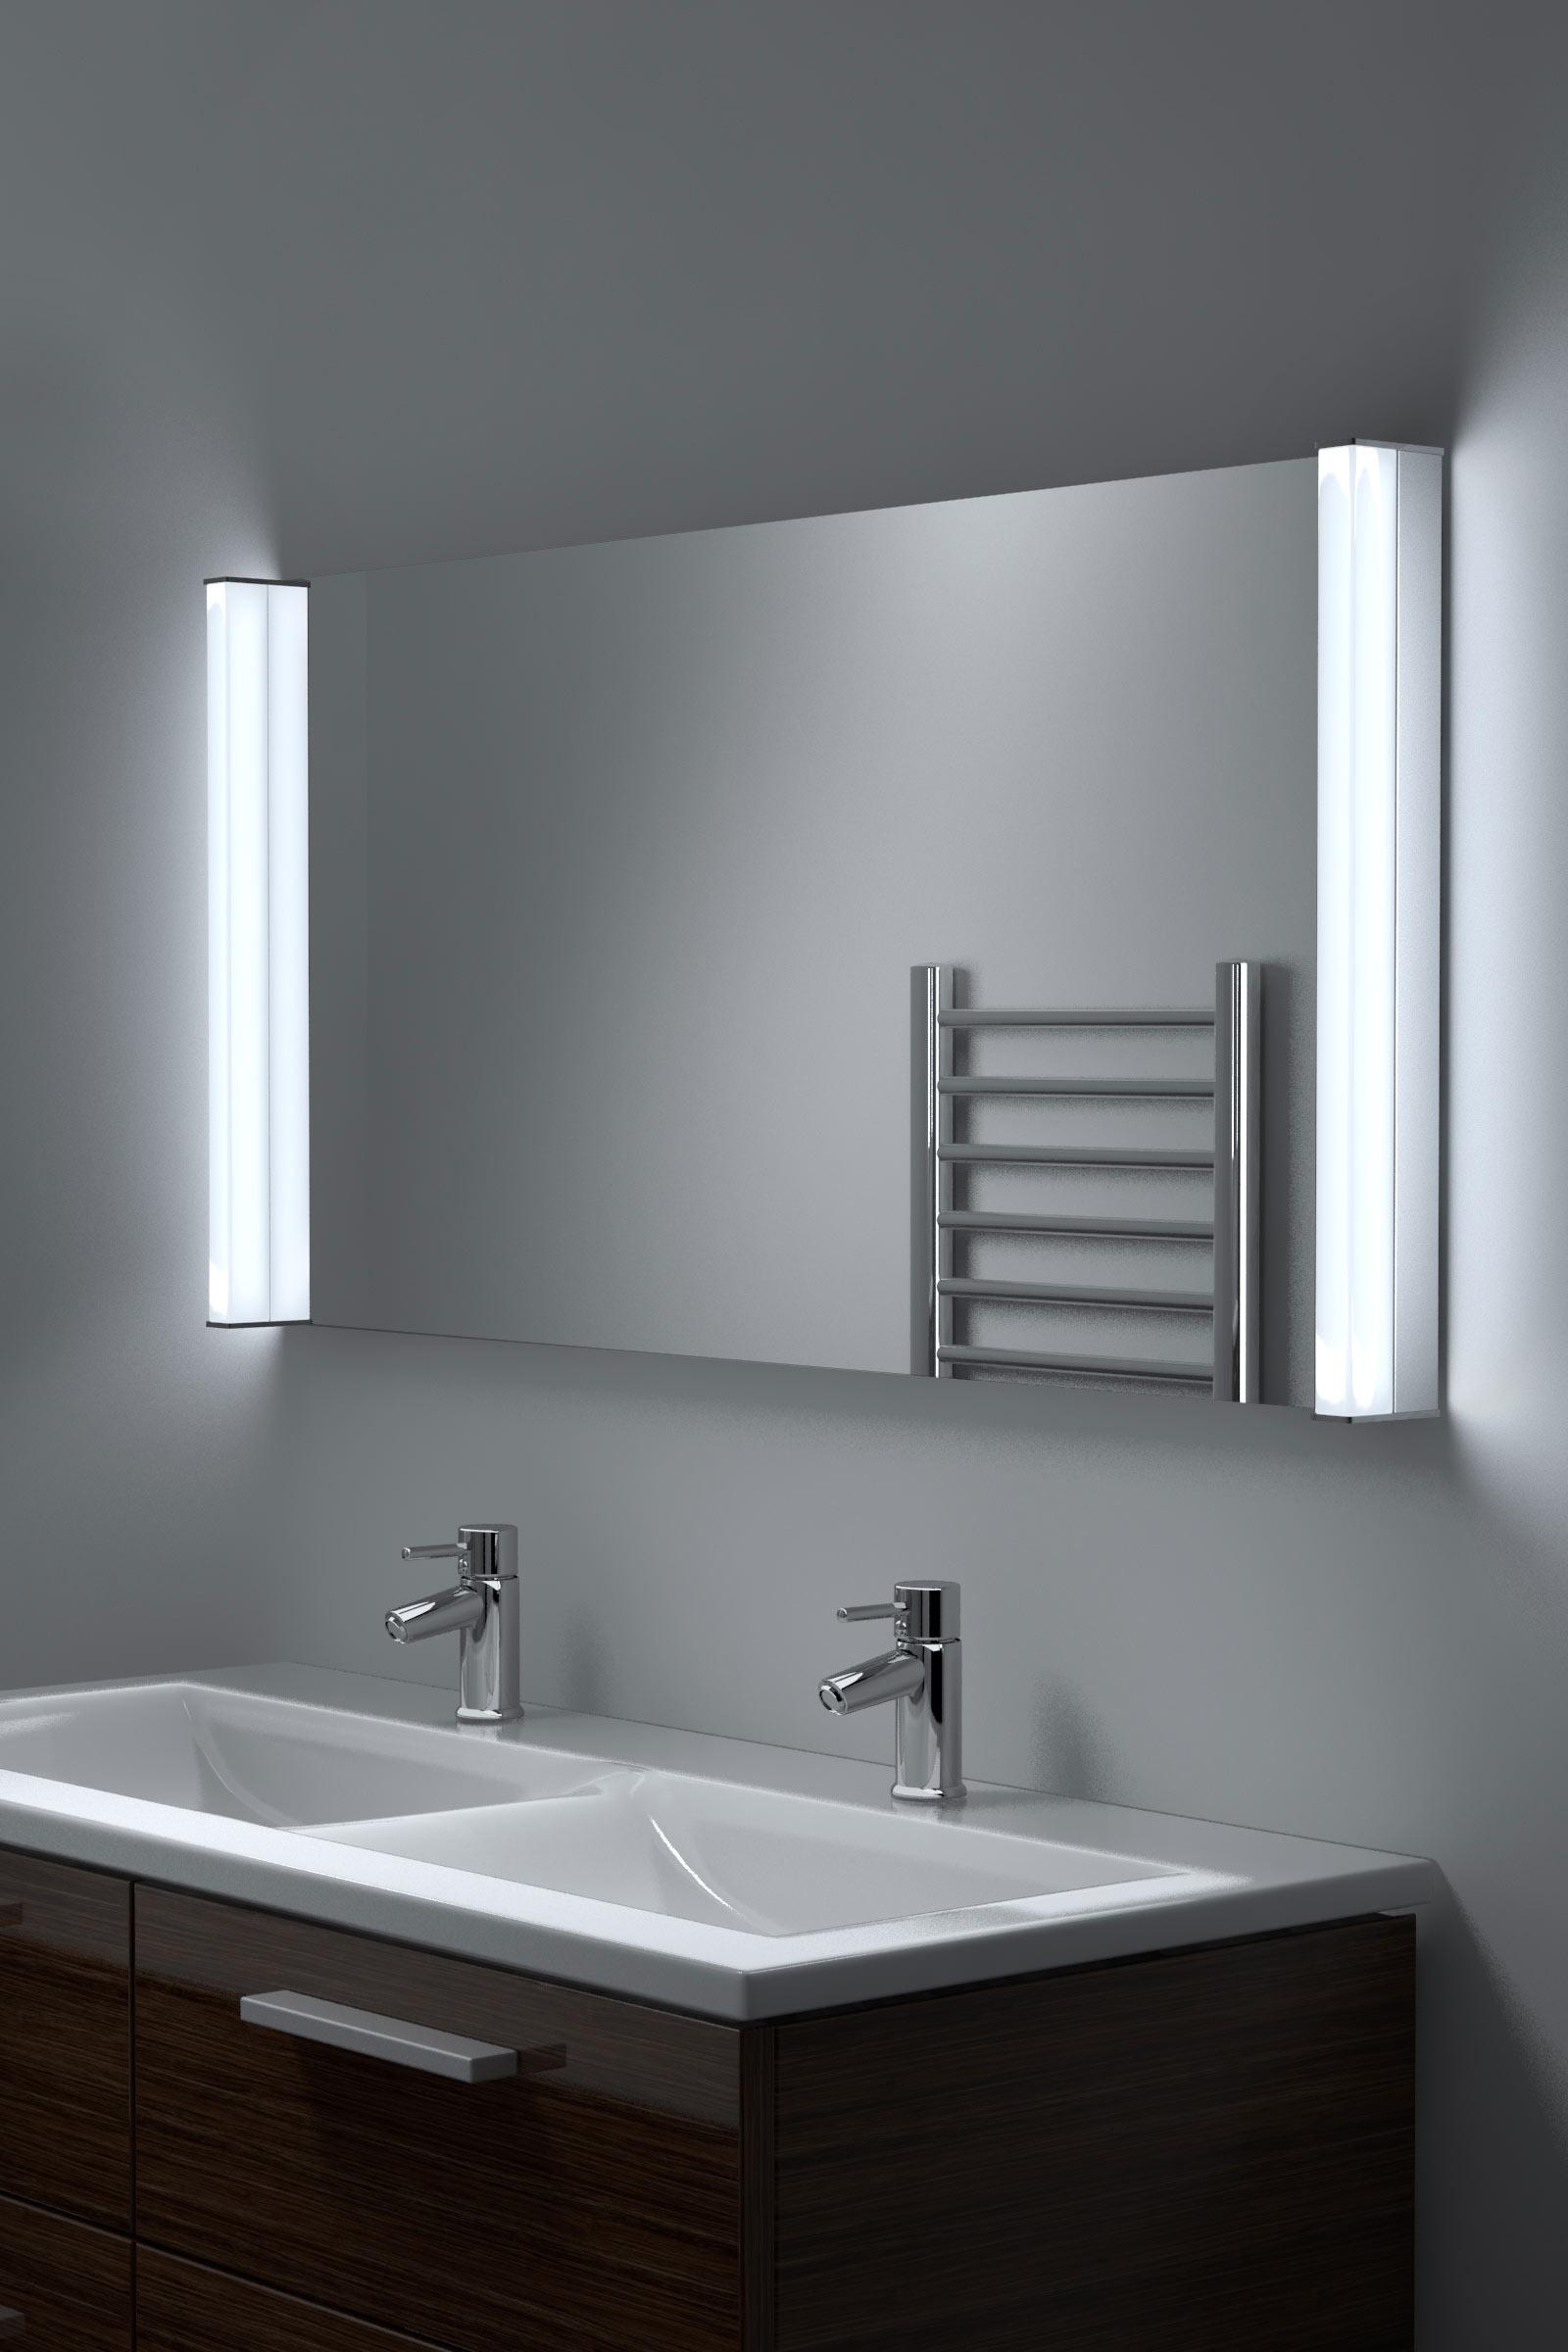 Miroir salle bain led super lumineuse avec anti bu e - Miroir salle de bain lumineux anti buee ...